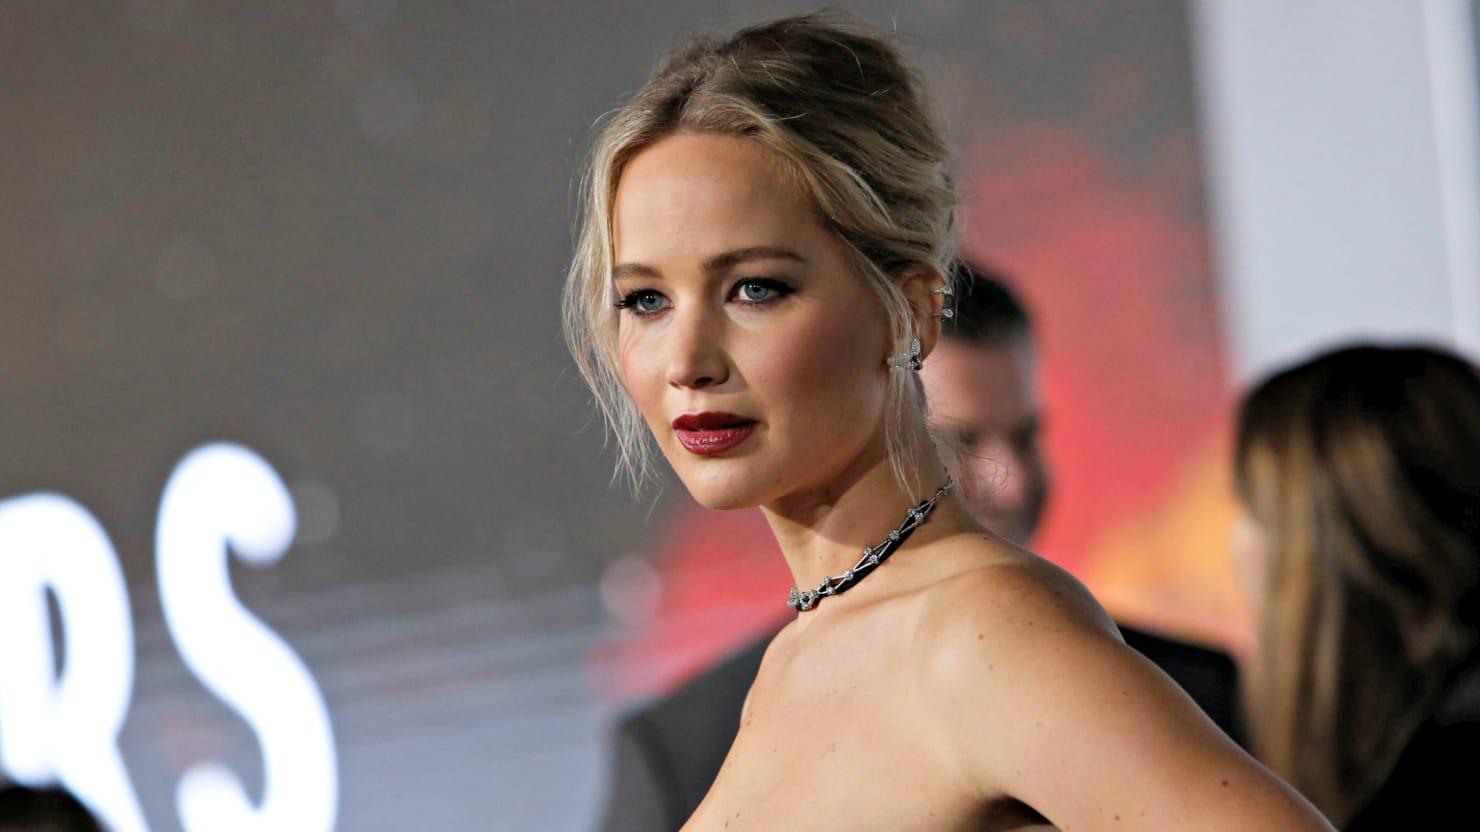 Nicholas Hoult on Ex Jennifer Lawrences Nude Photo Hack